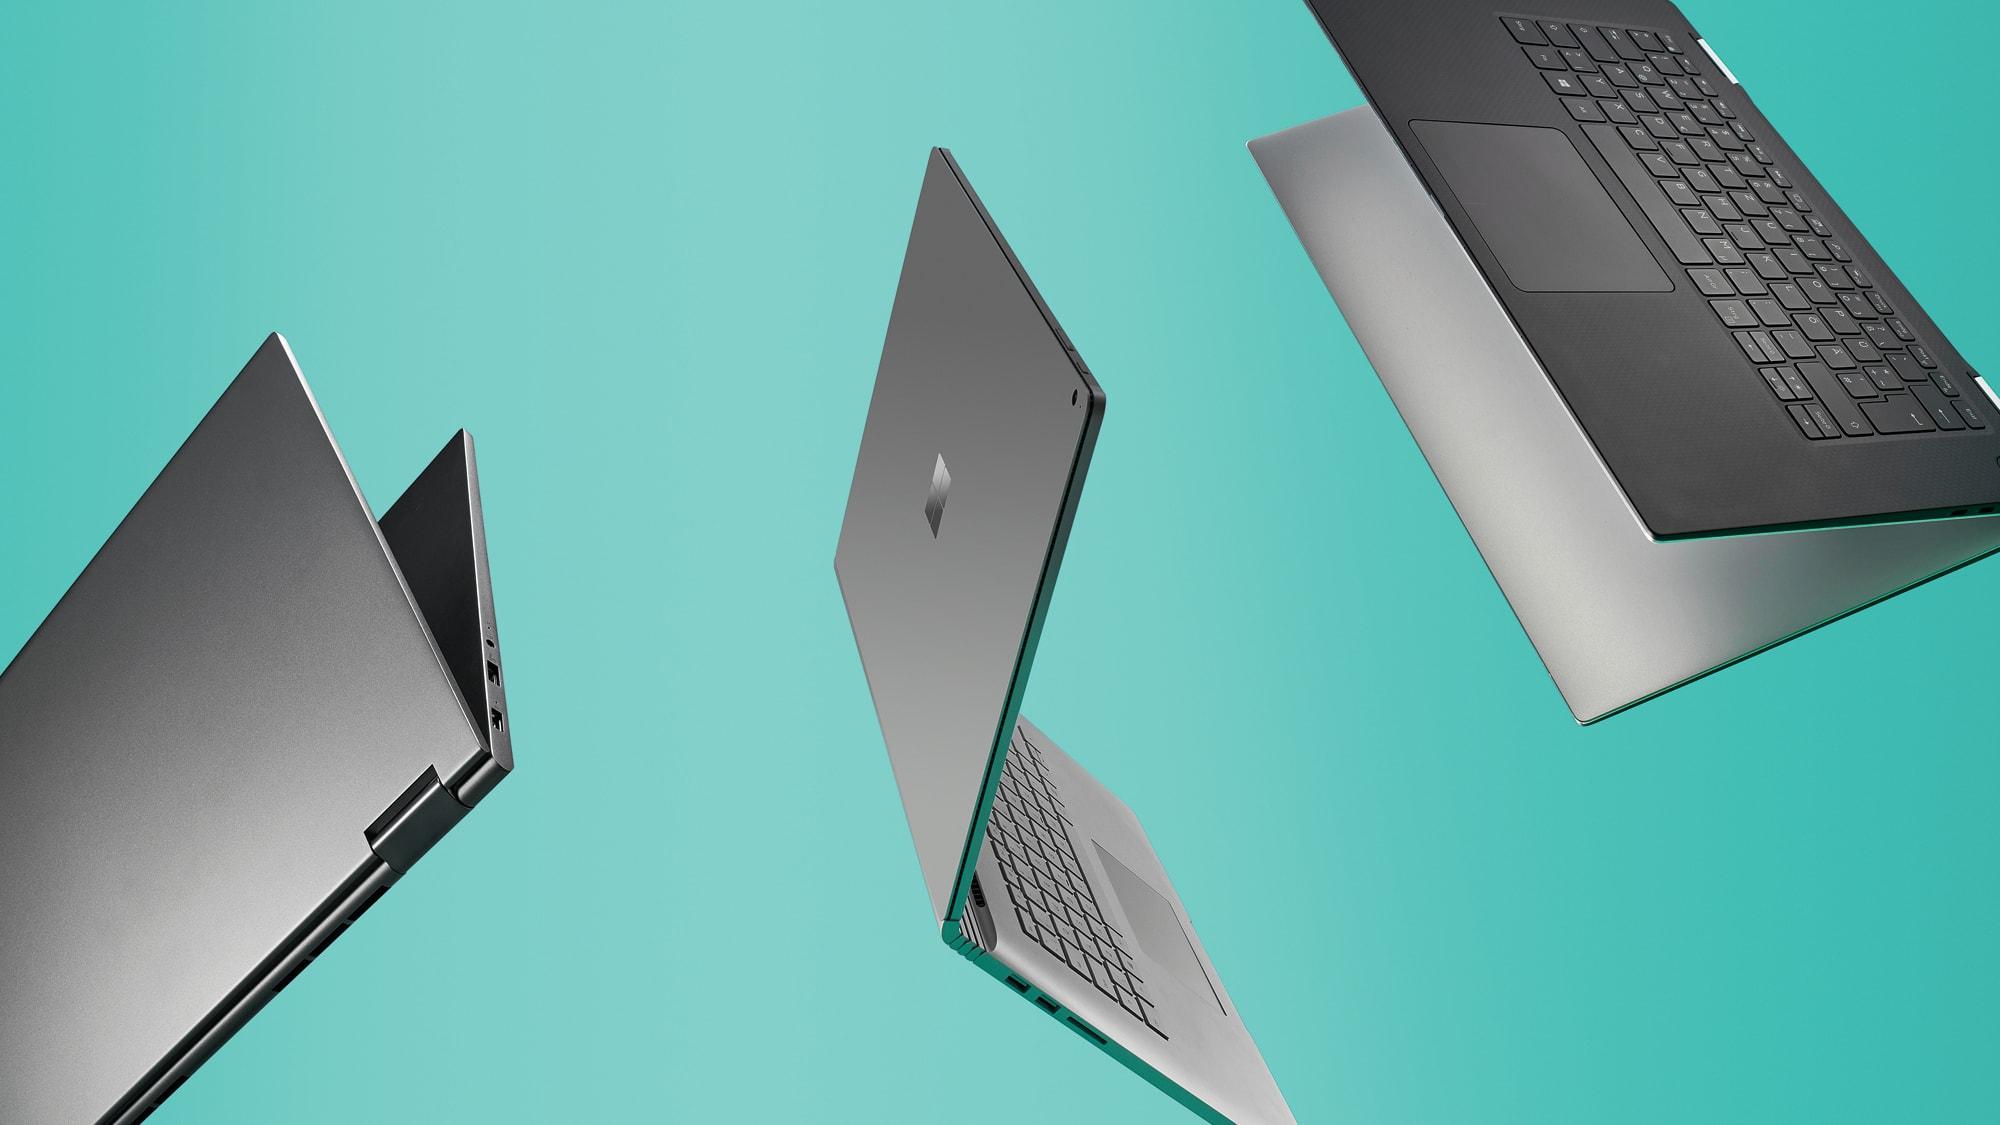 Best Websites for Buying a Laptop Online